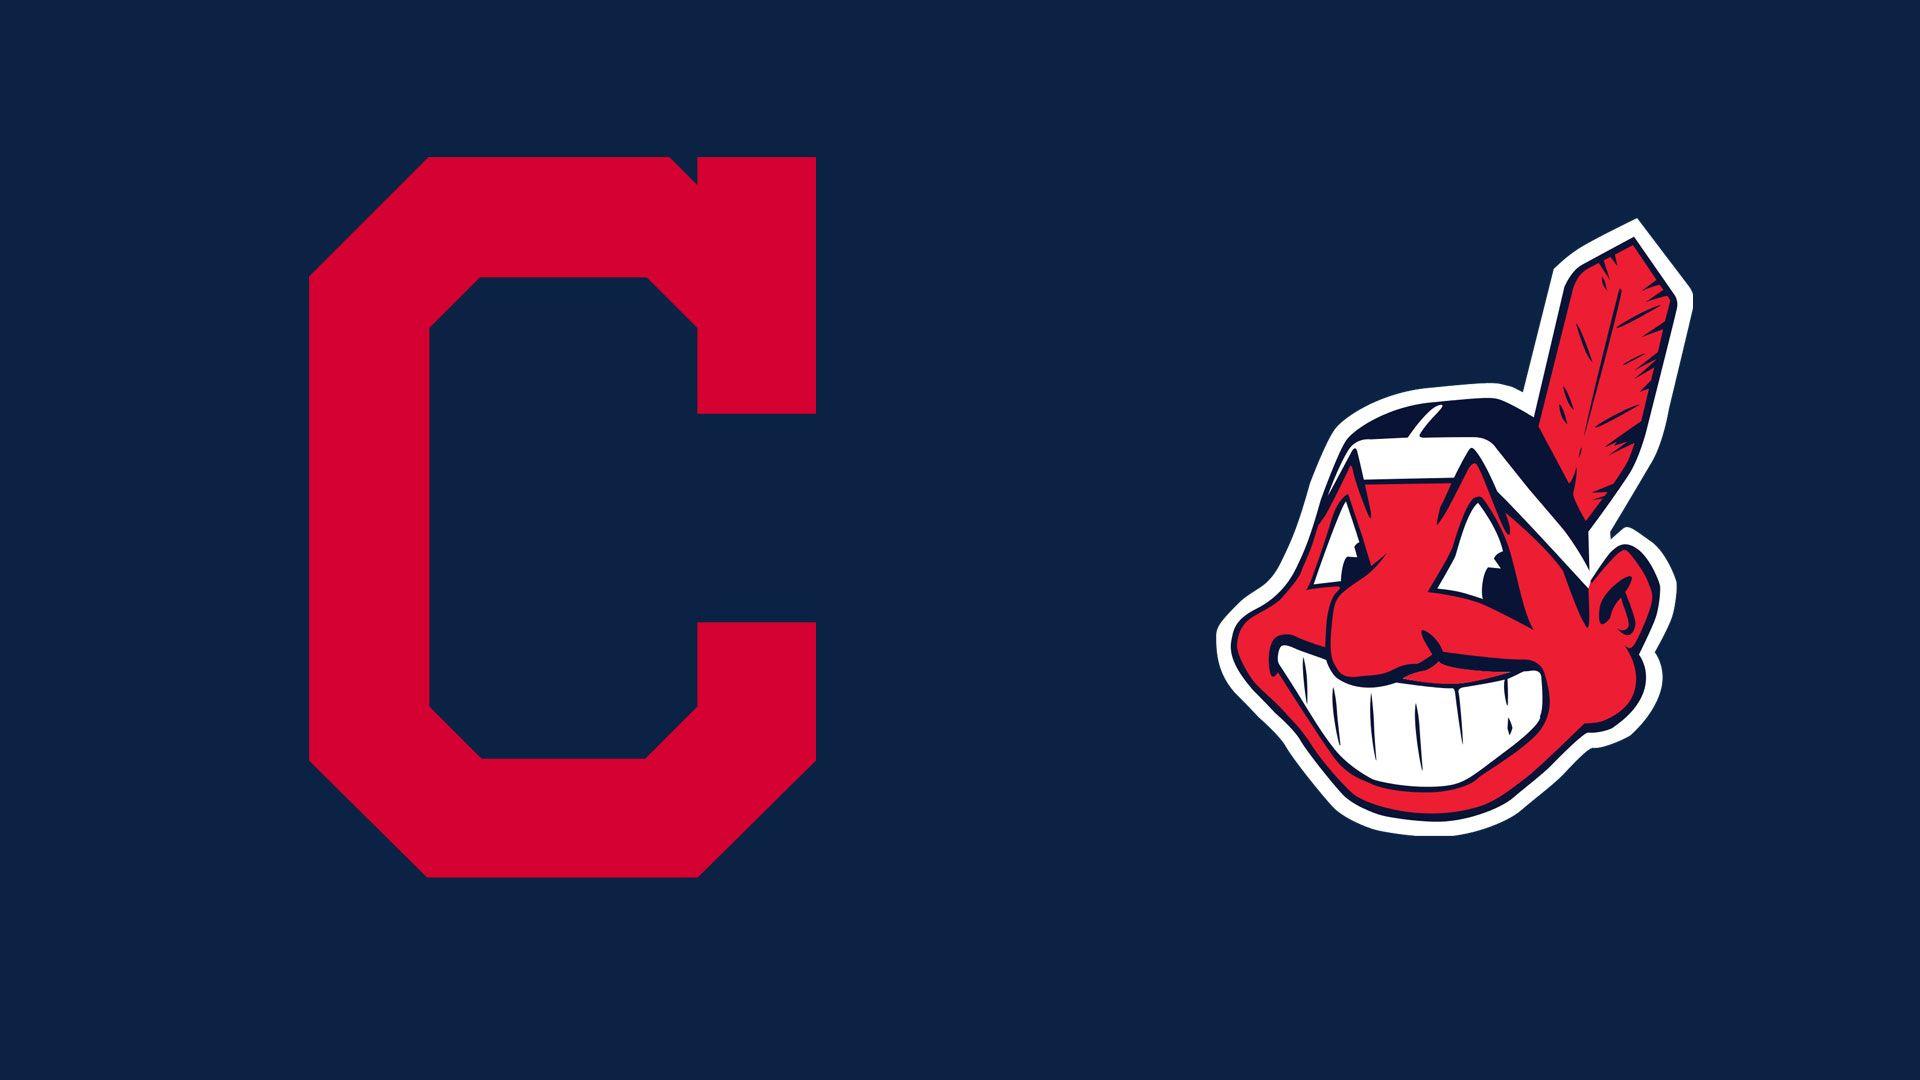 Mlb Cleveland Indians Logo 1920x1080 Full Hd 16 9 1